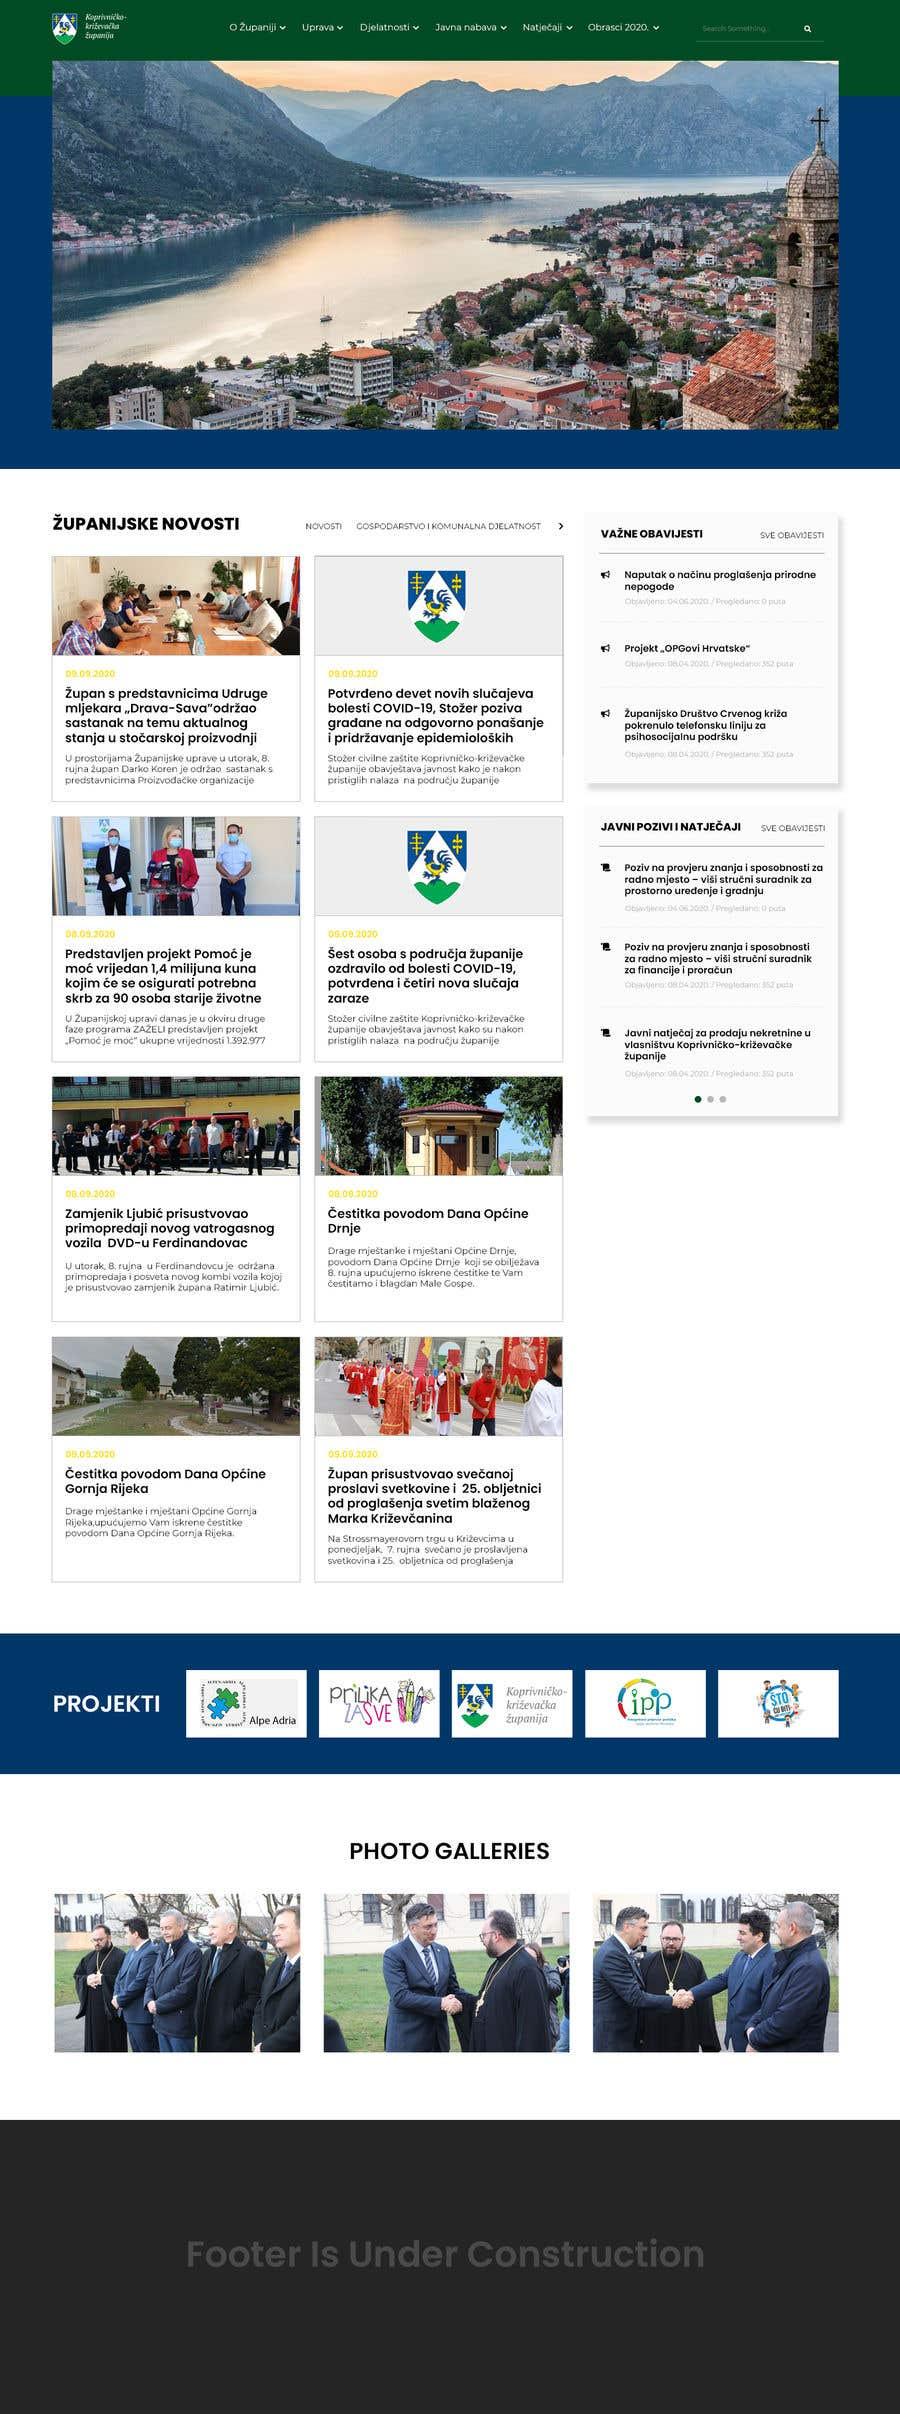 Penyertaan Peraduan #                                        54                                      untuk                                         Home page redesign project